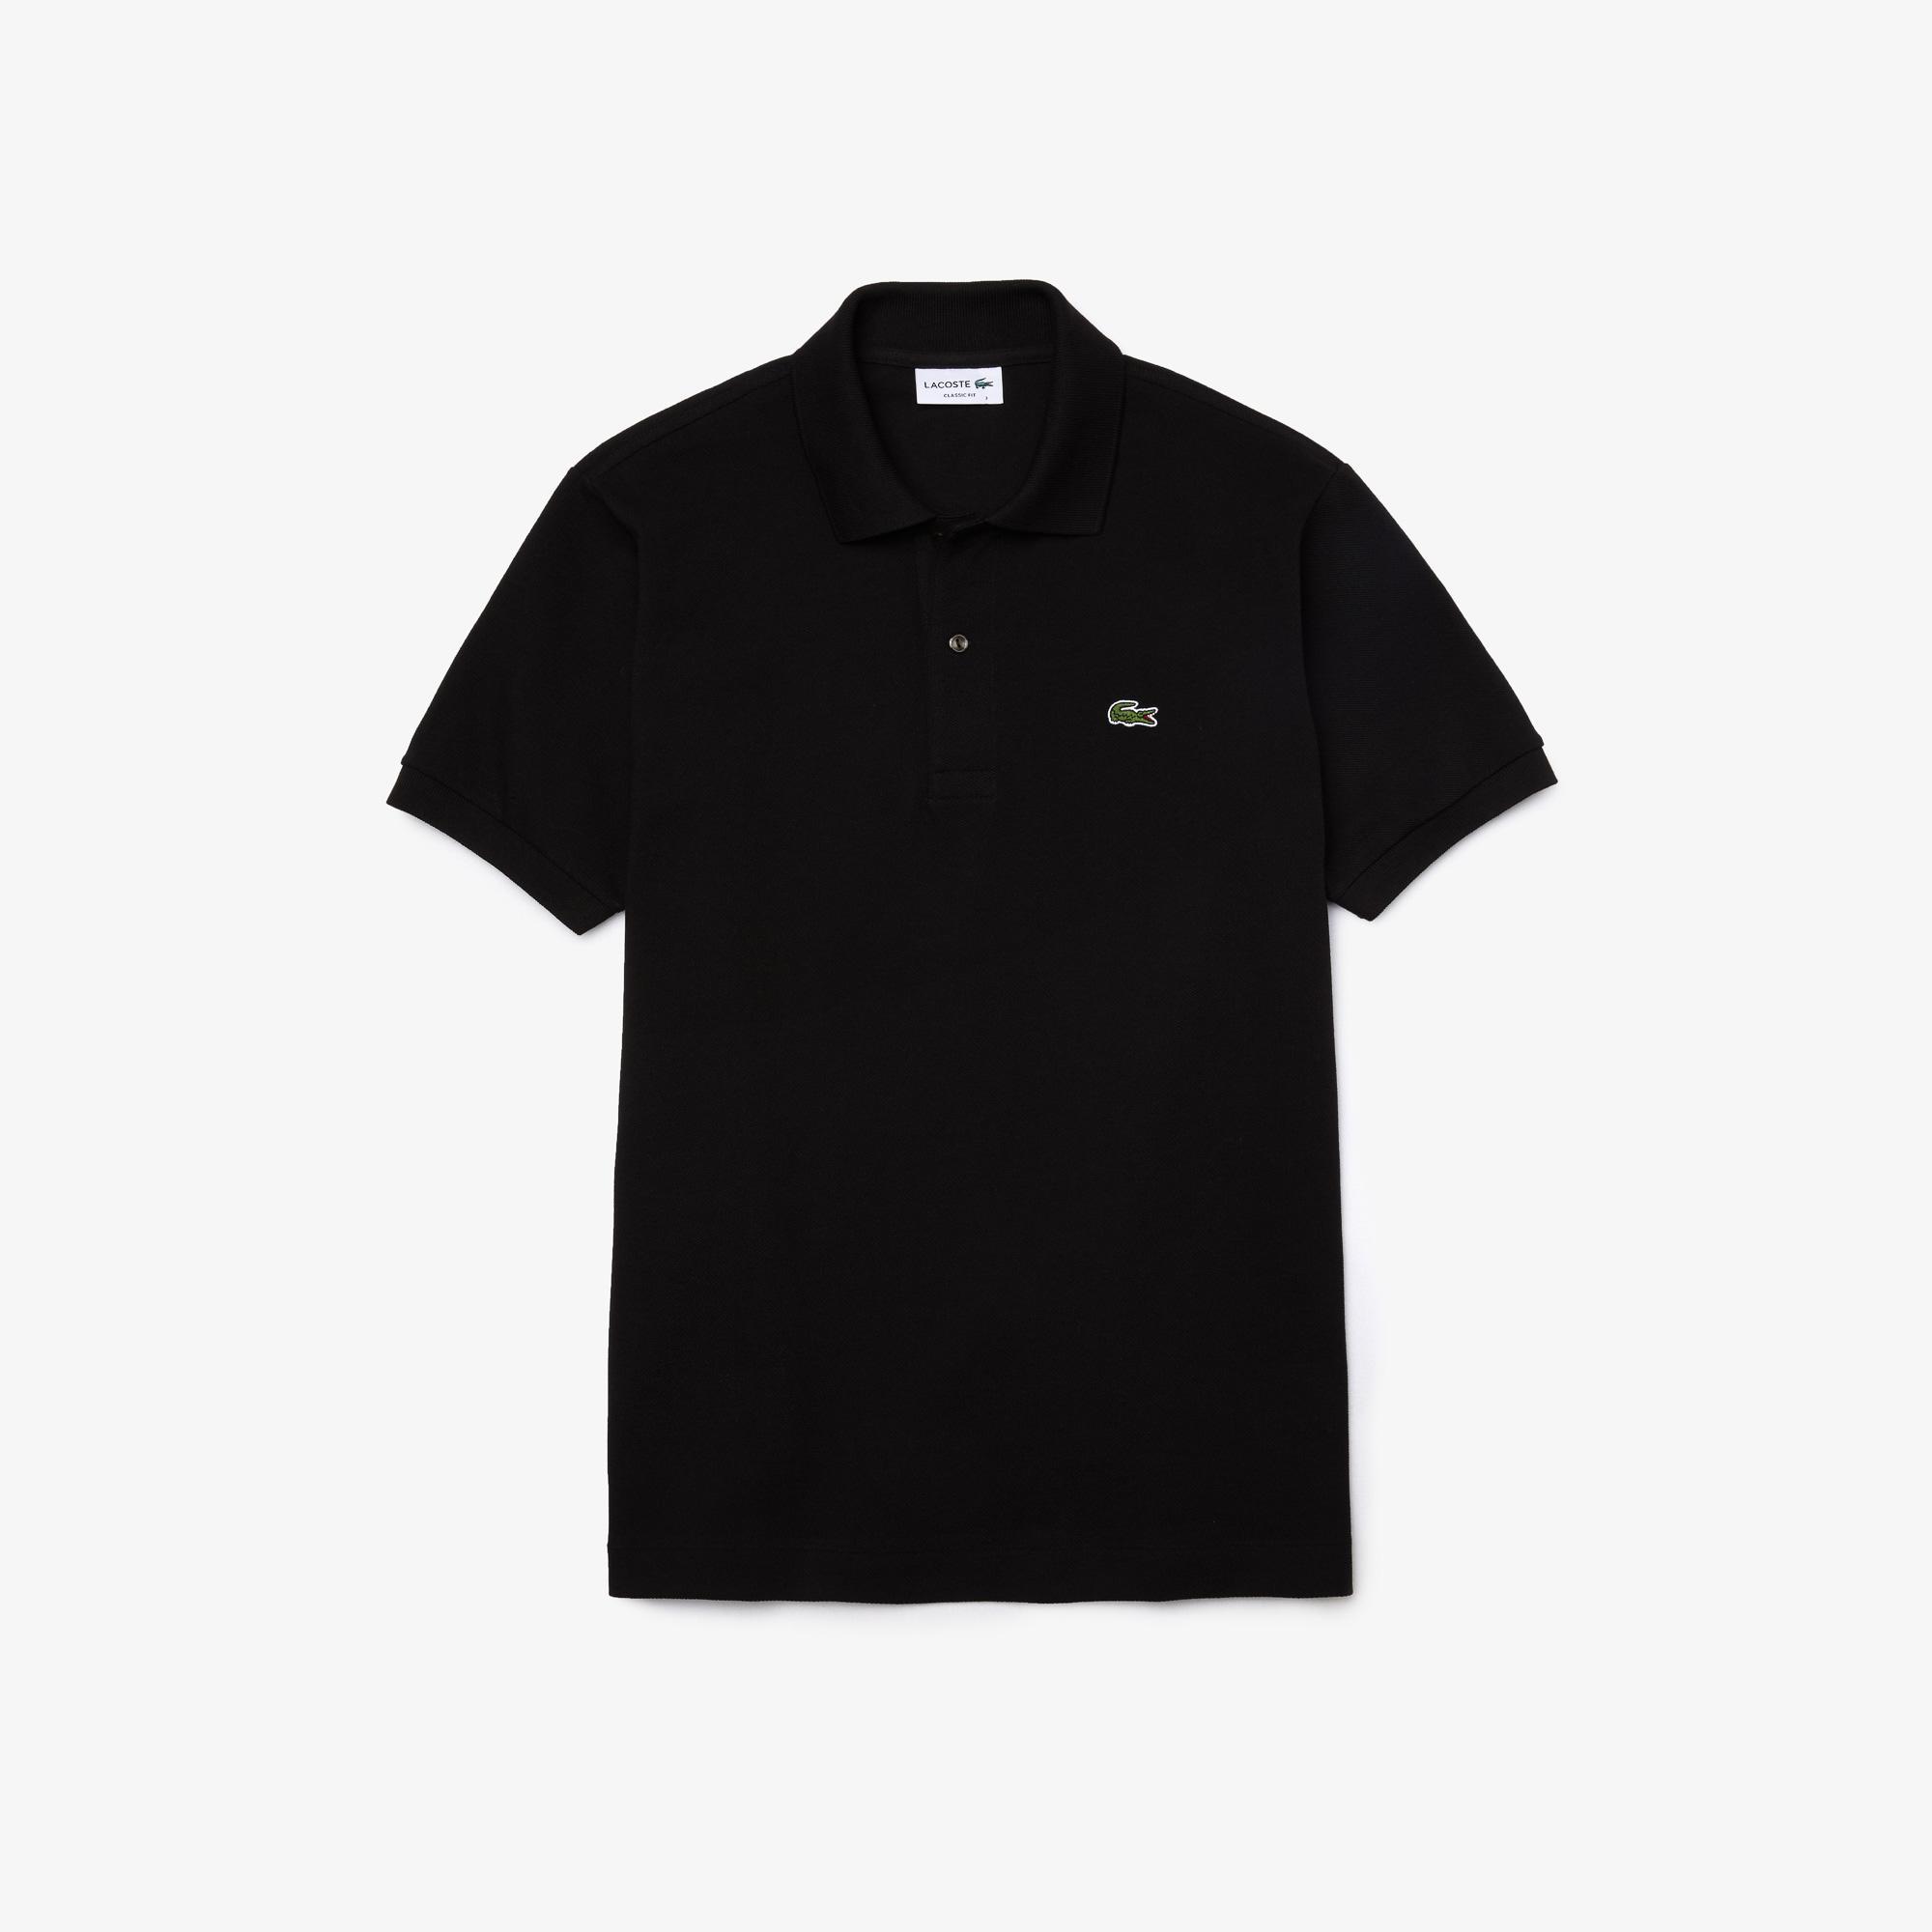 Lacoste Erkek Klasik Fit L1212 Siyah Polo